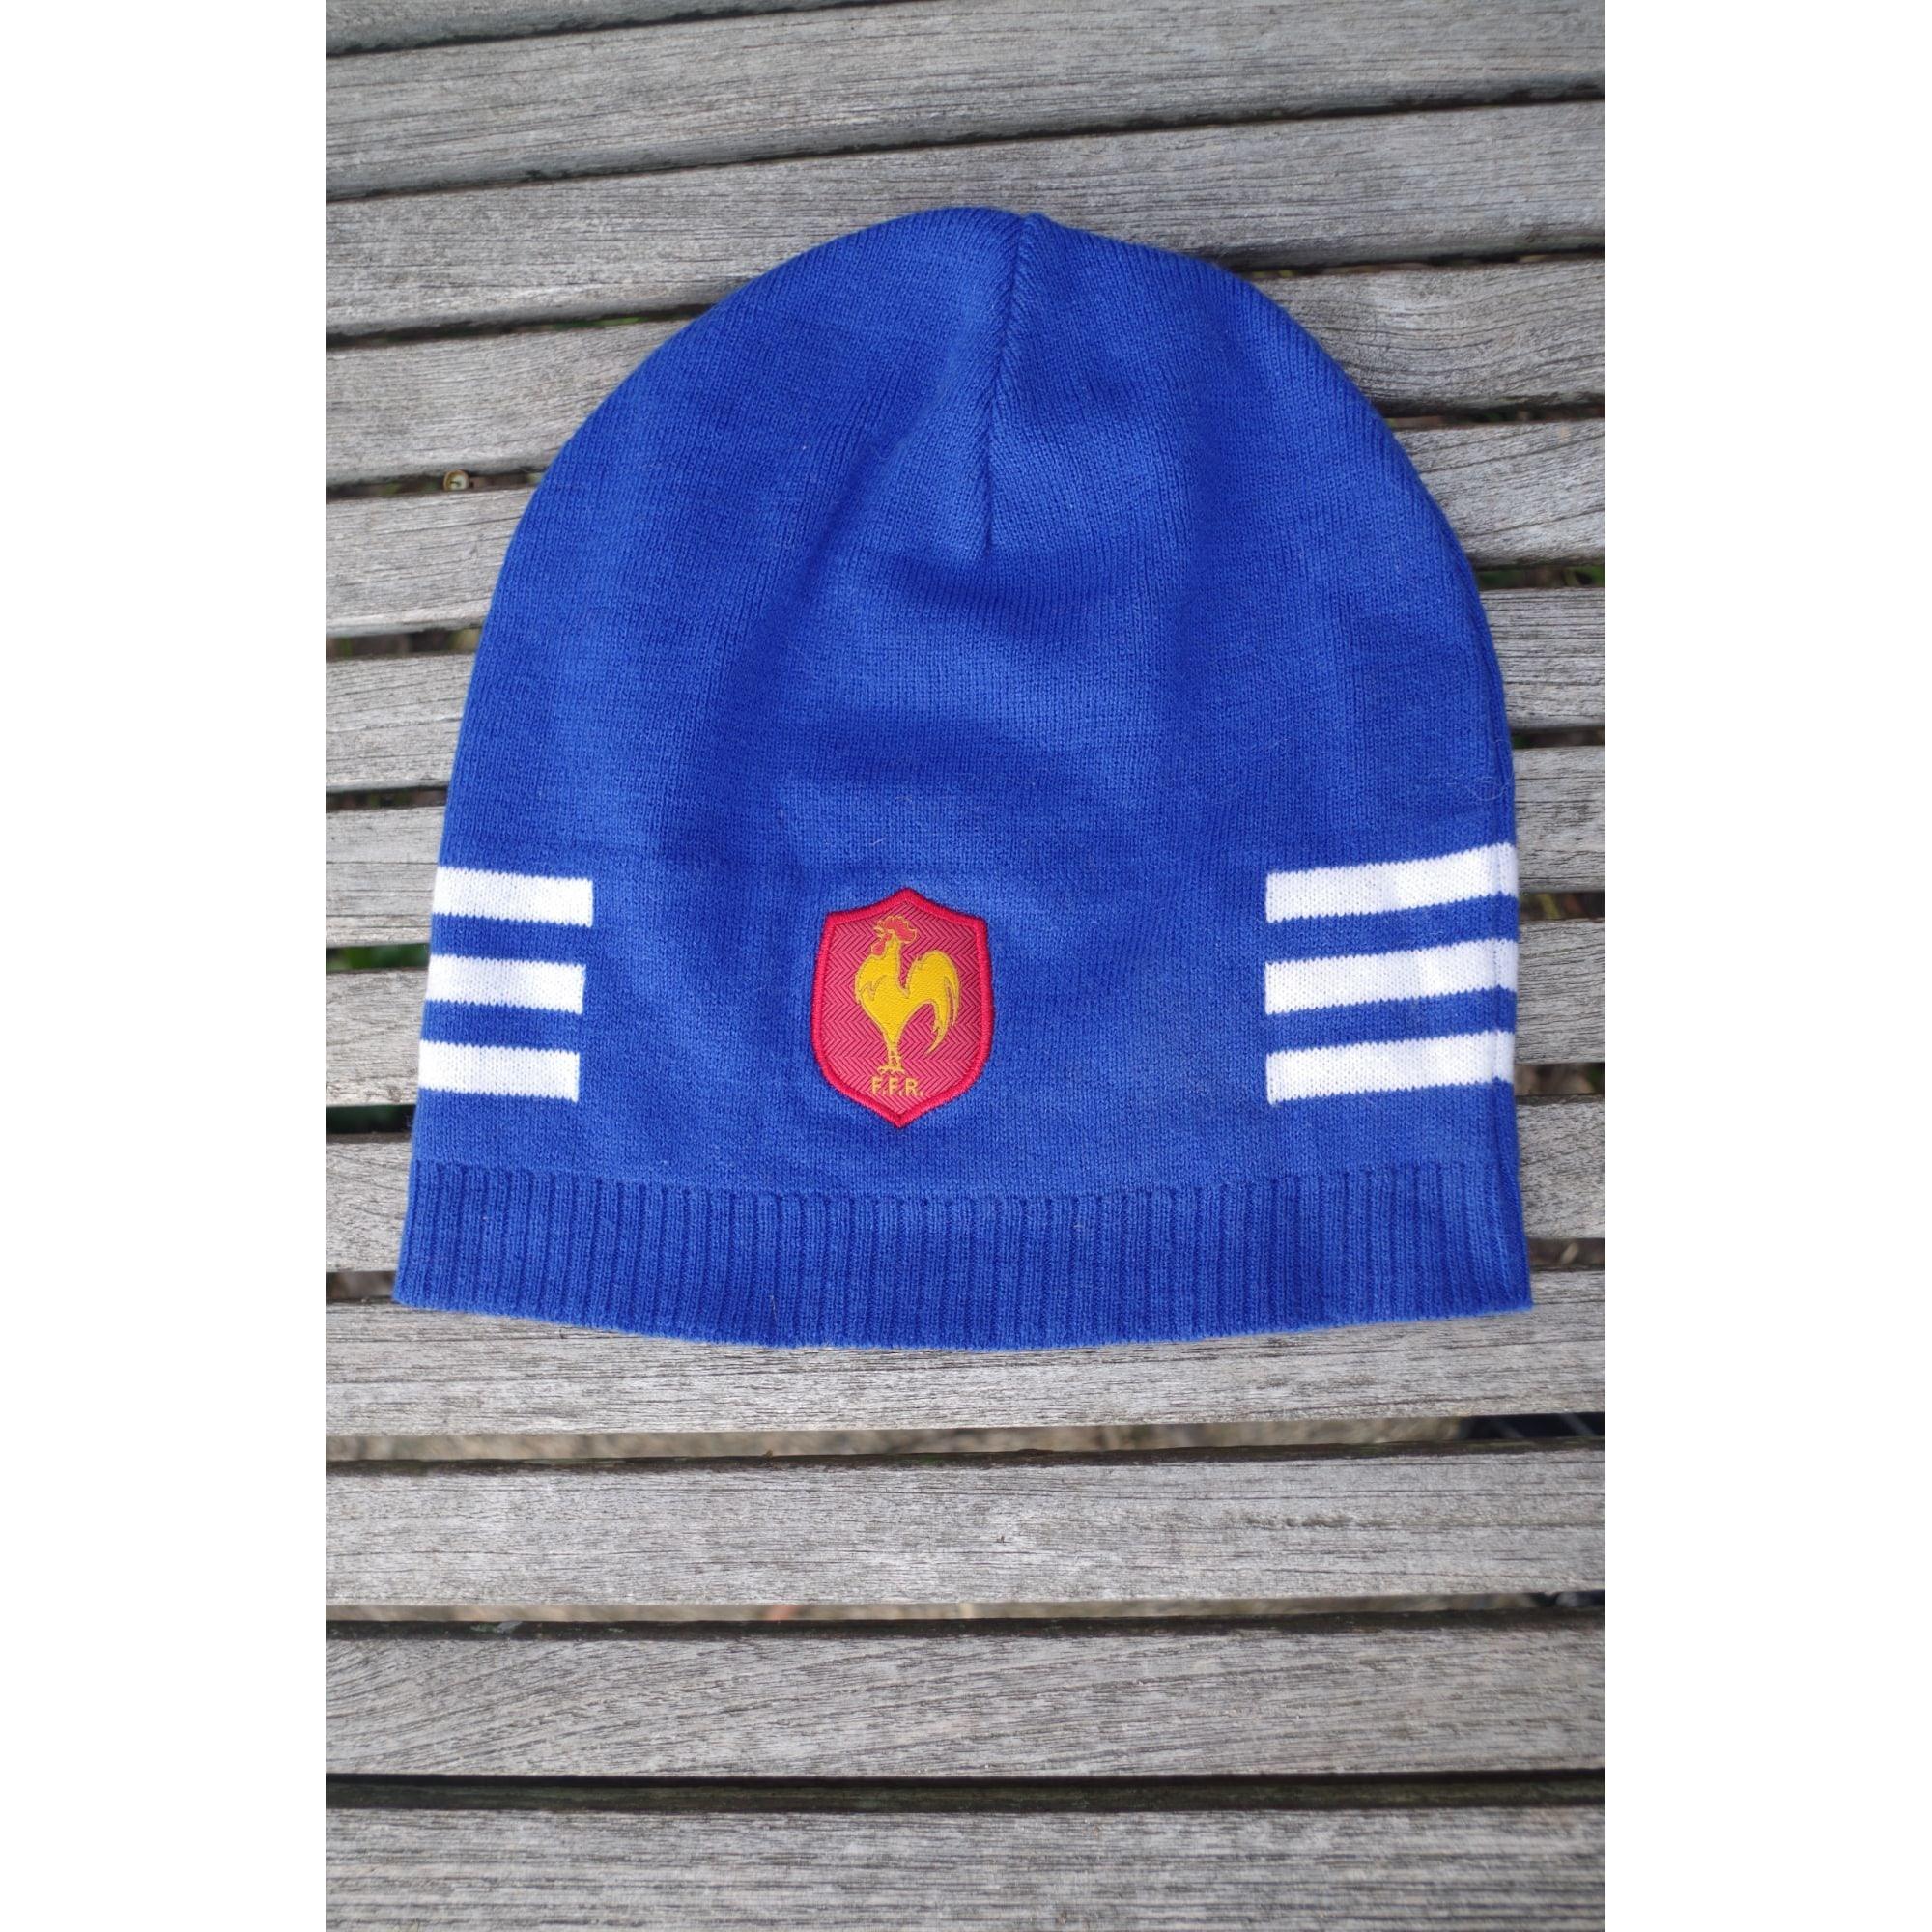 Bonnet ADIDAS Bleu, bleu marine, bleu turquoise